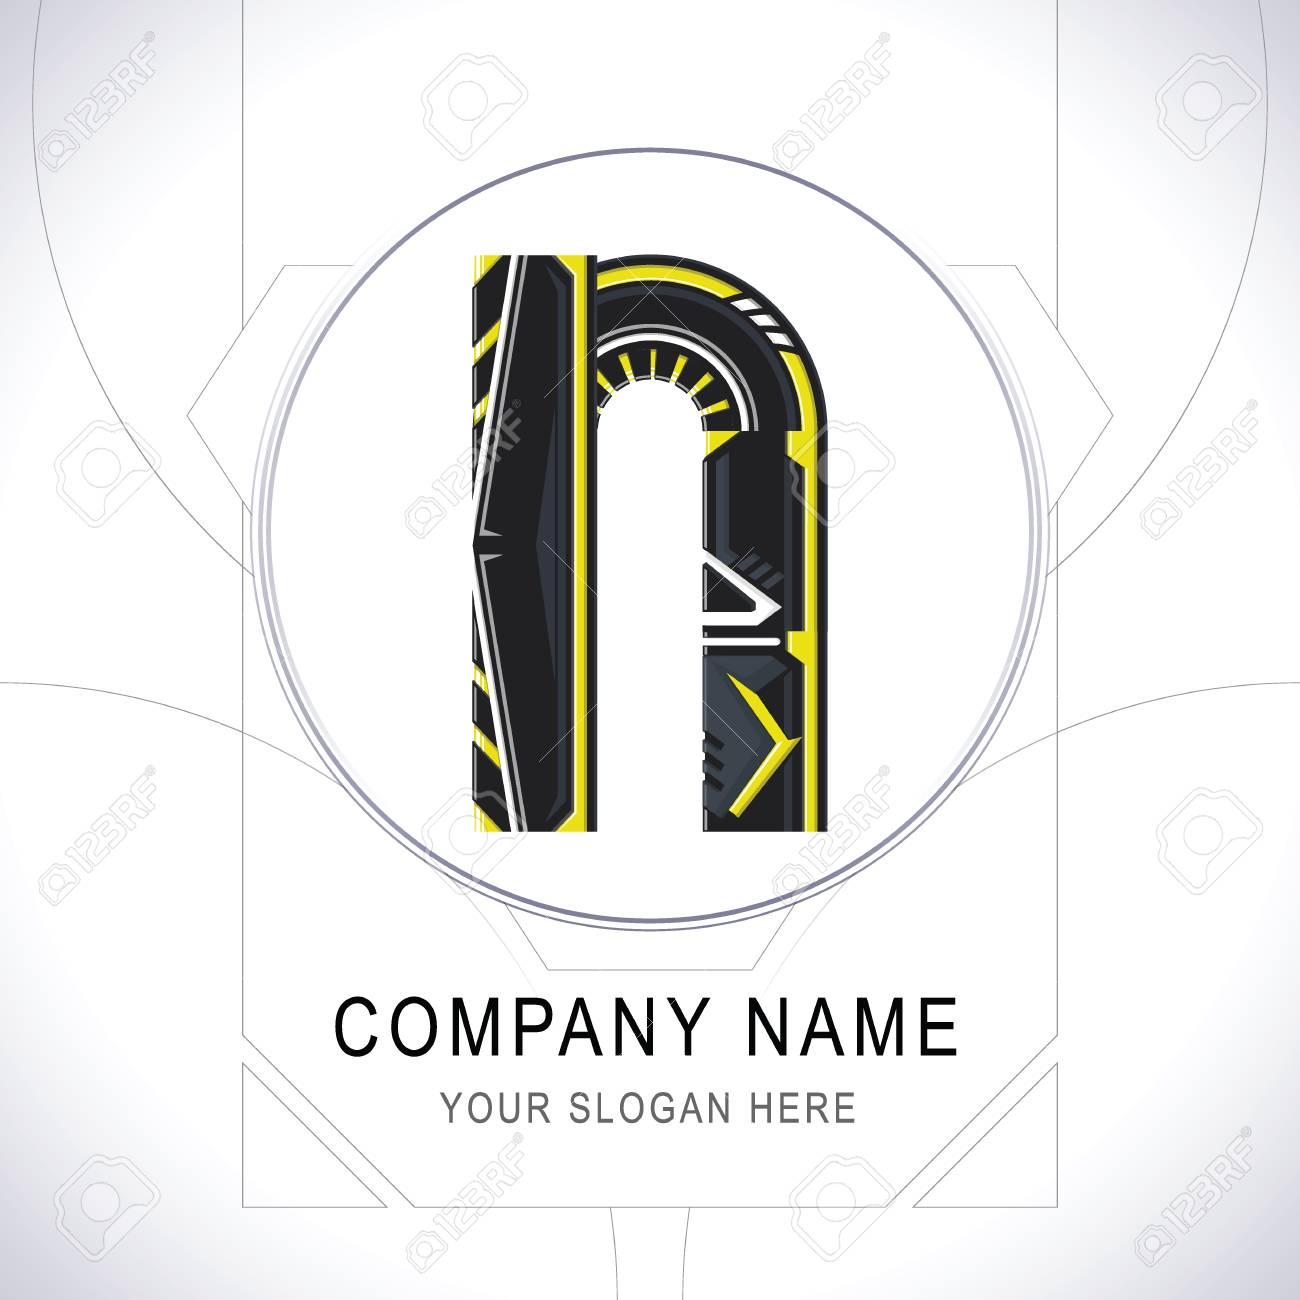 Letter N Gamer Community Black Logo Creative Yellow Line Alphabet